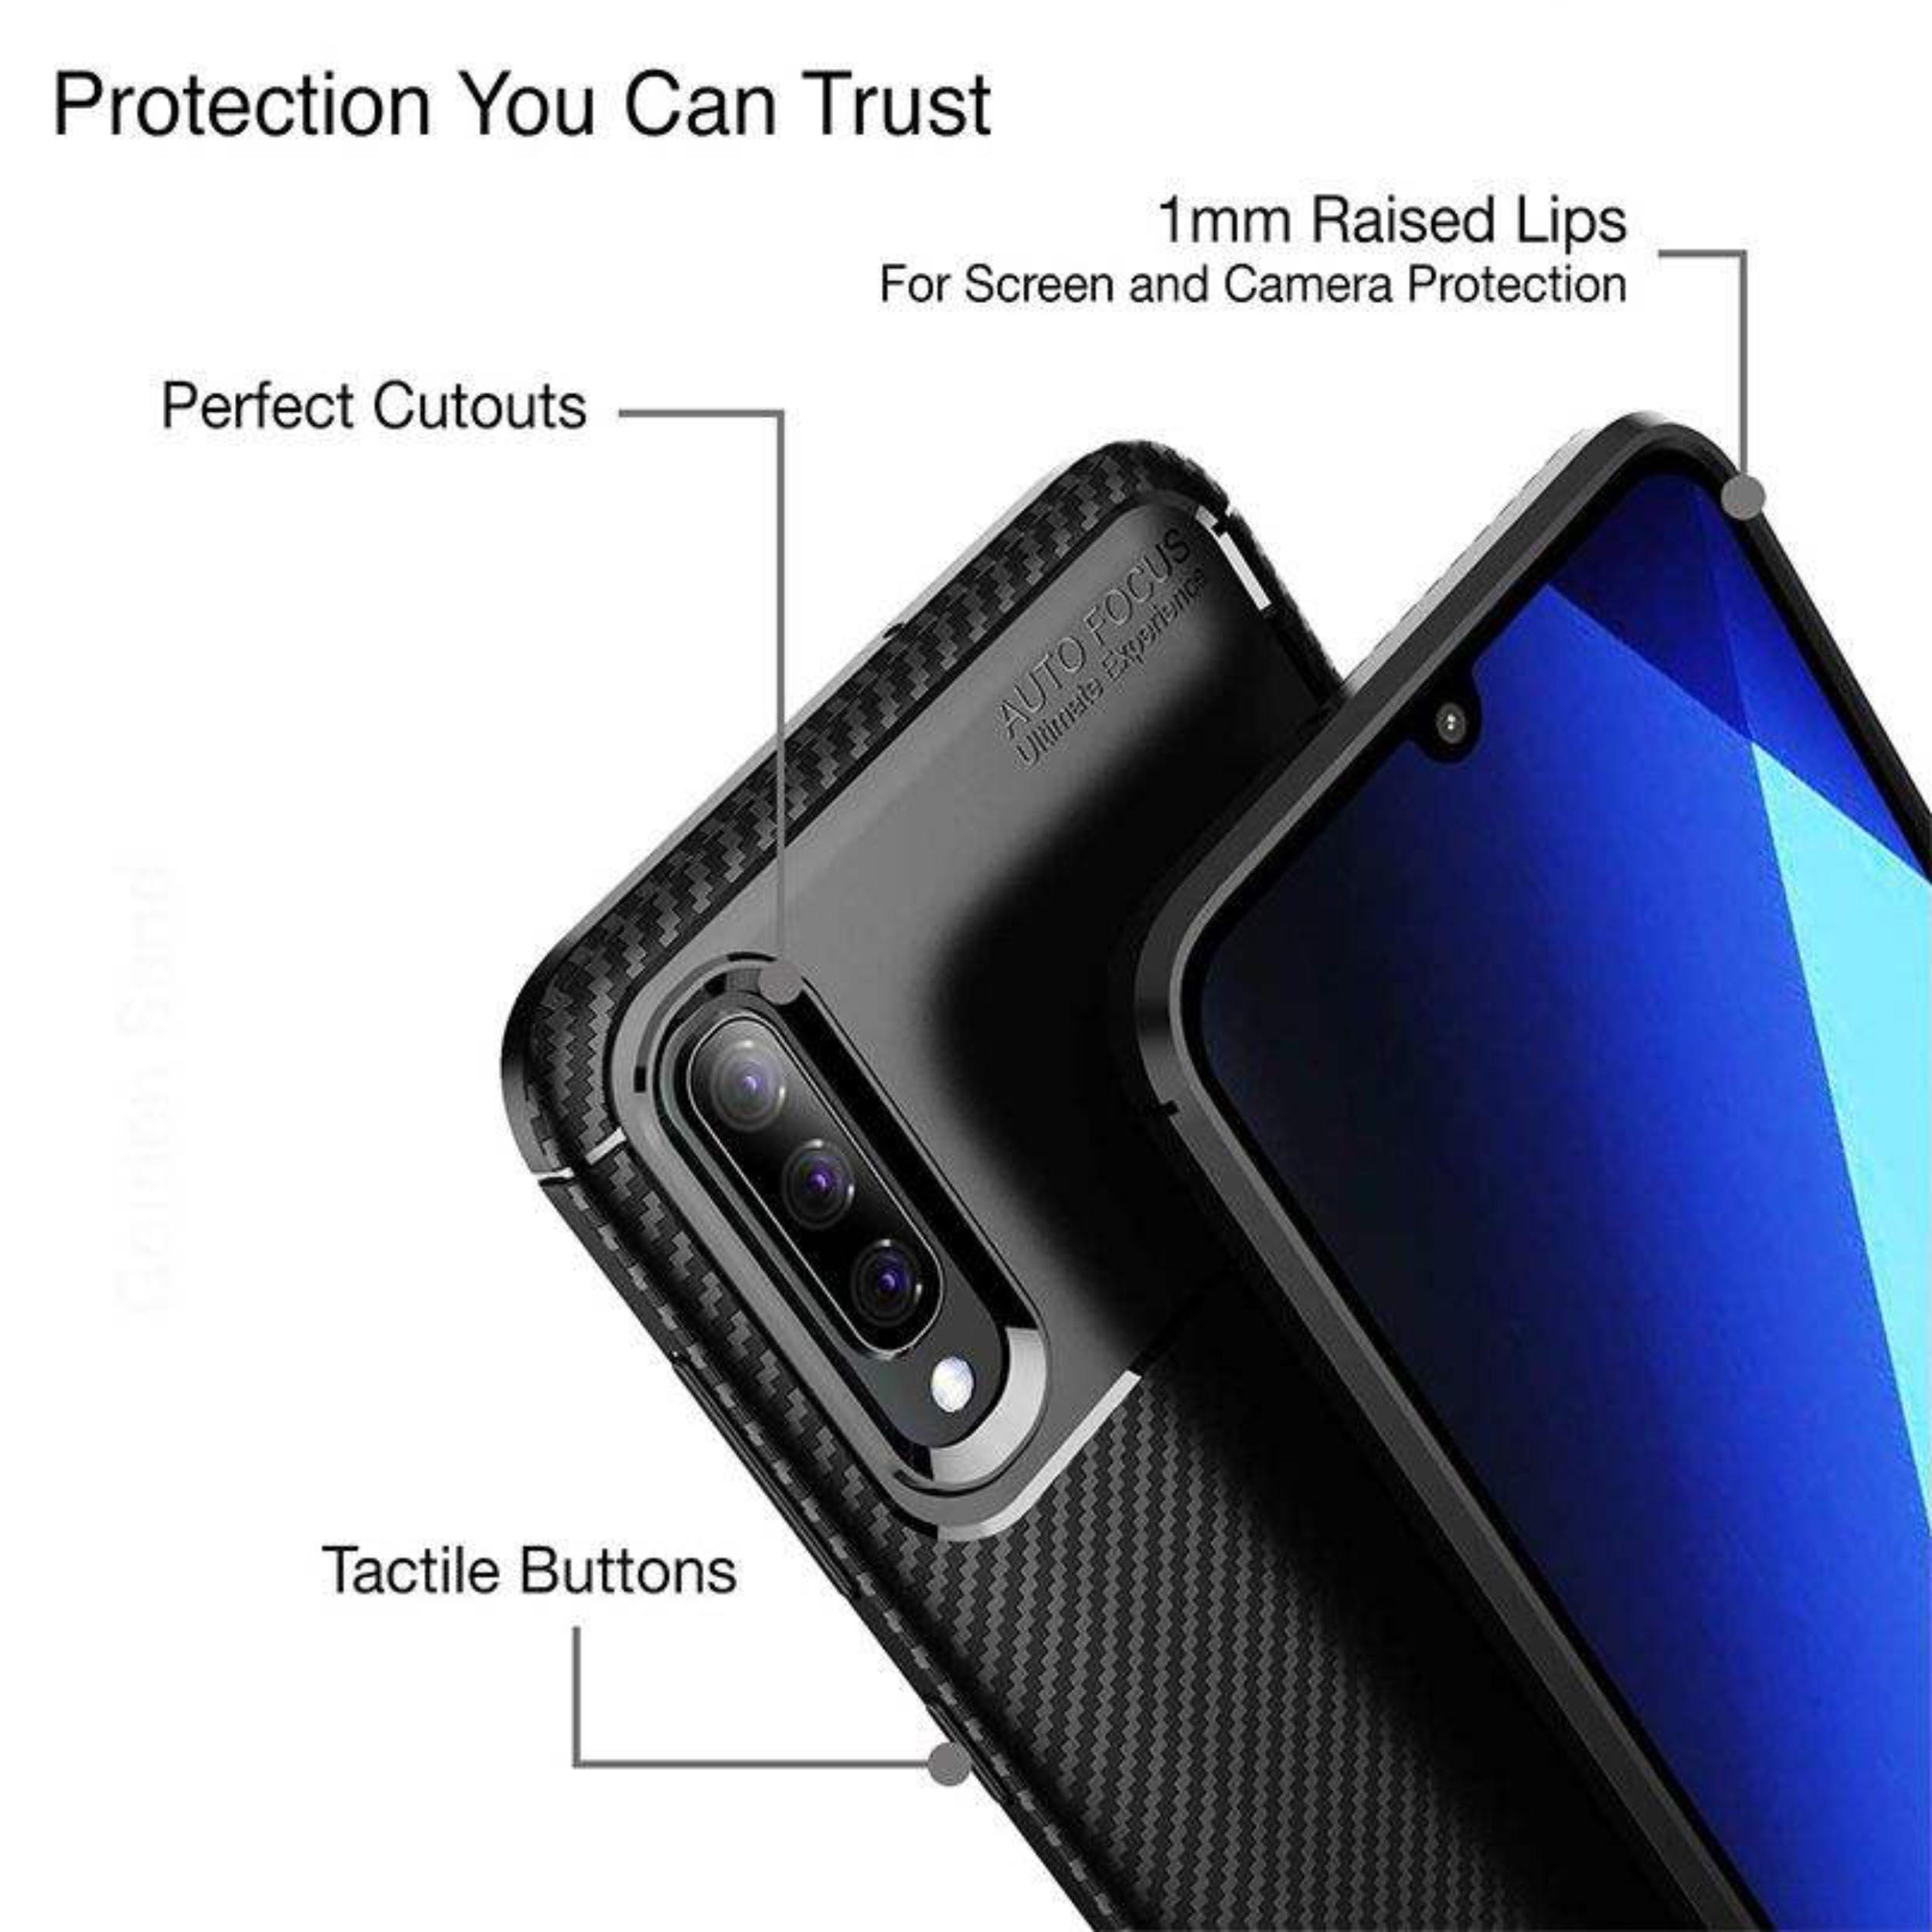 کاور لاین کینگ مدل A21 مناسب برای گوشی موبایل سامسونگ Galaxy A50/A50s/A30s thumb 2 5